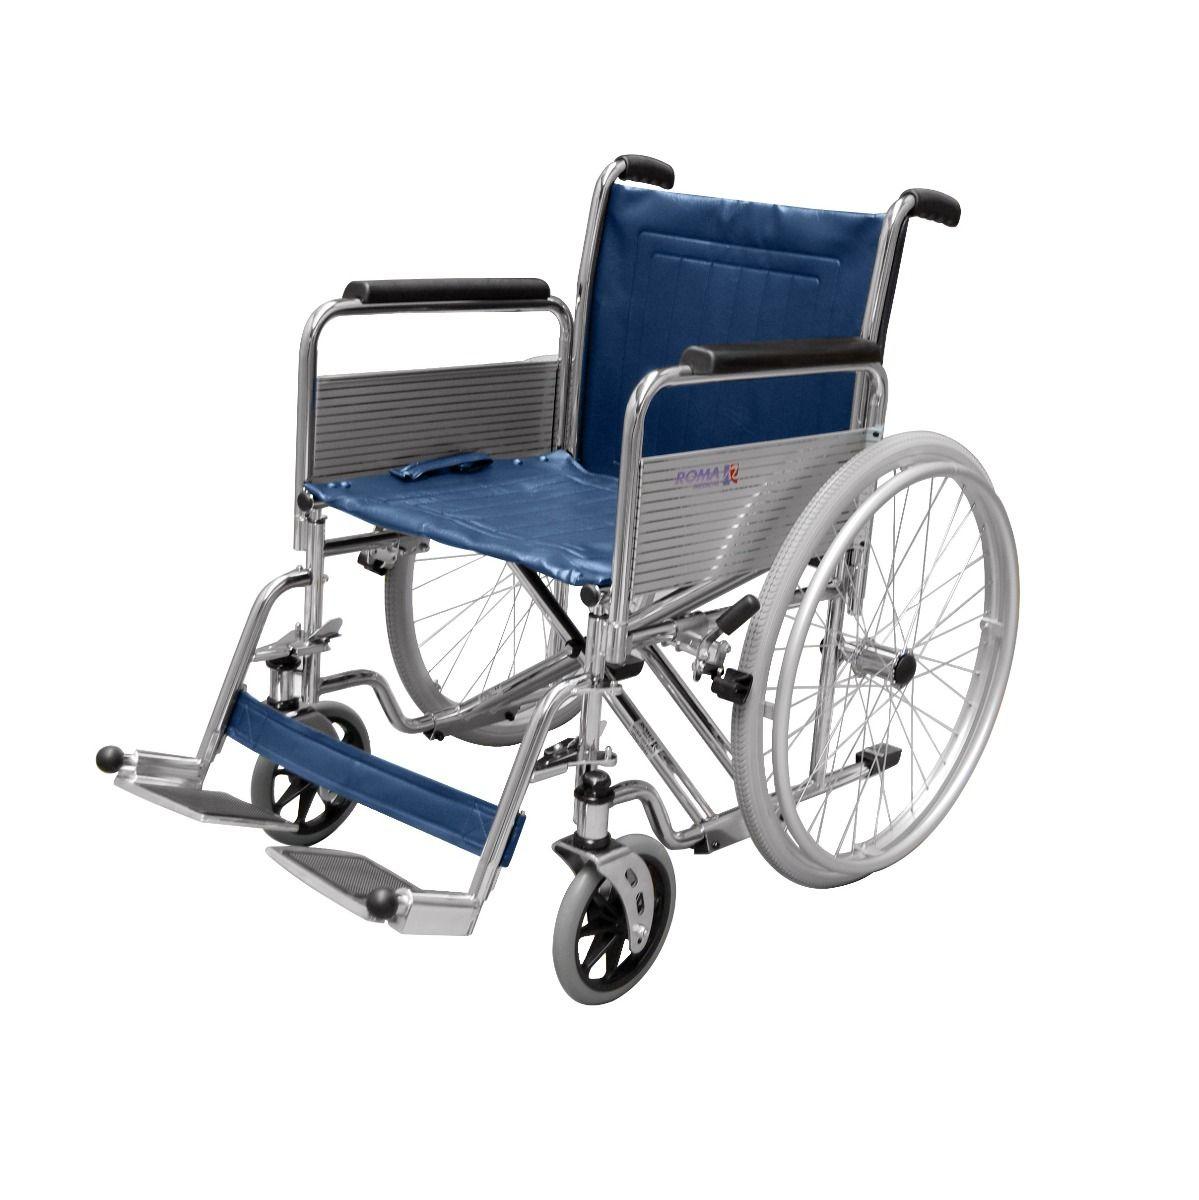 Roma Medical 1472 XDHeavy Duty Bariatric Wheelchair Side View